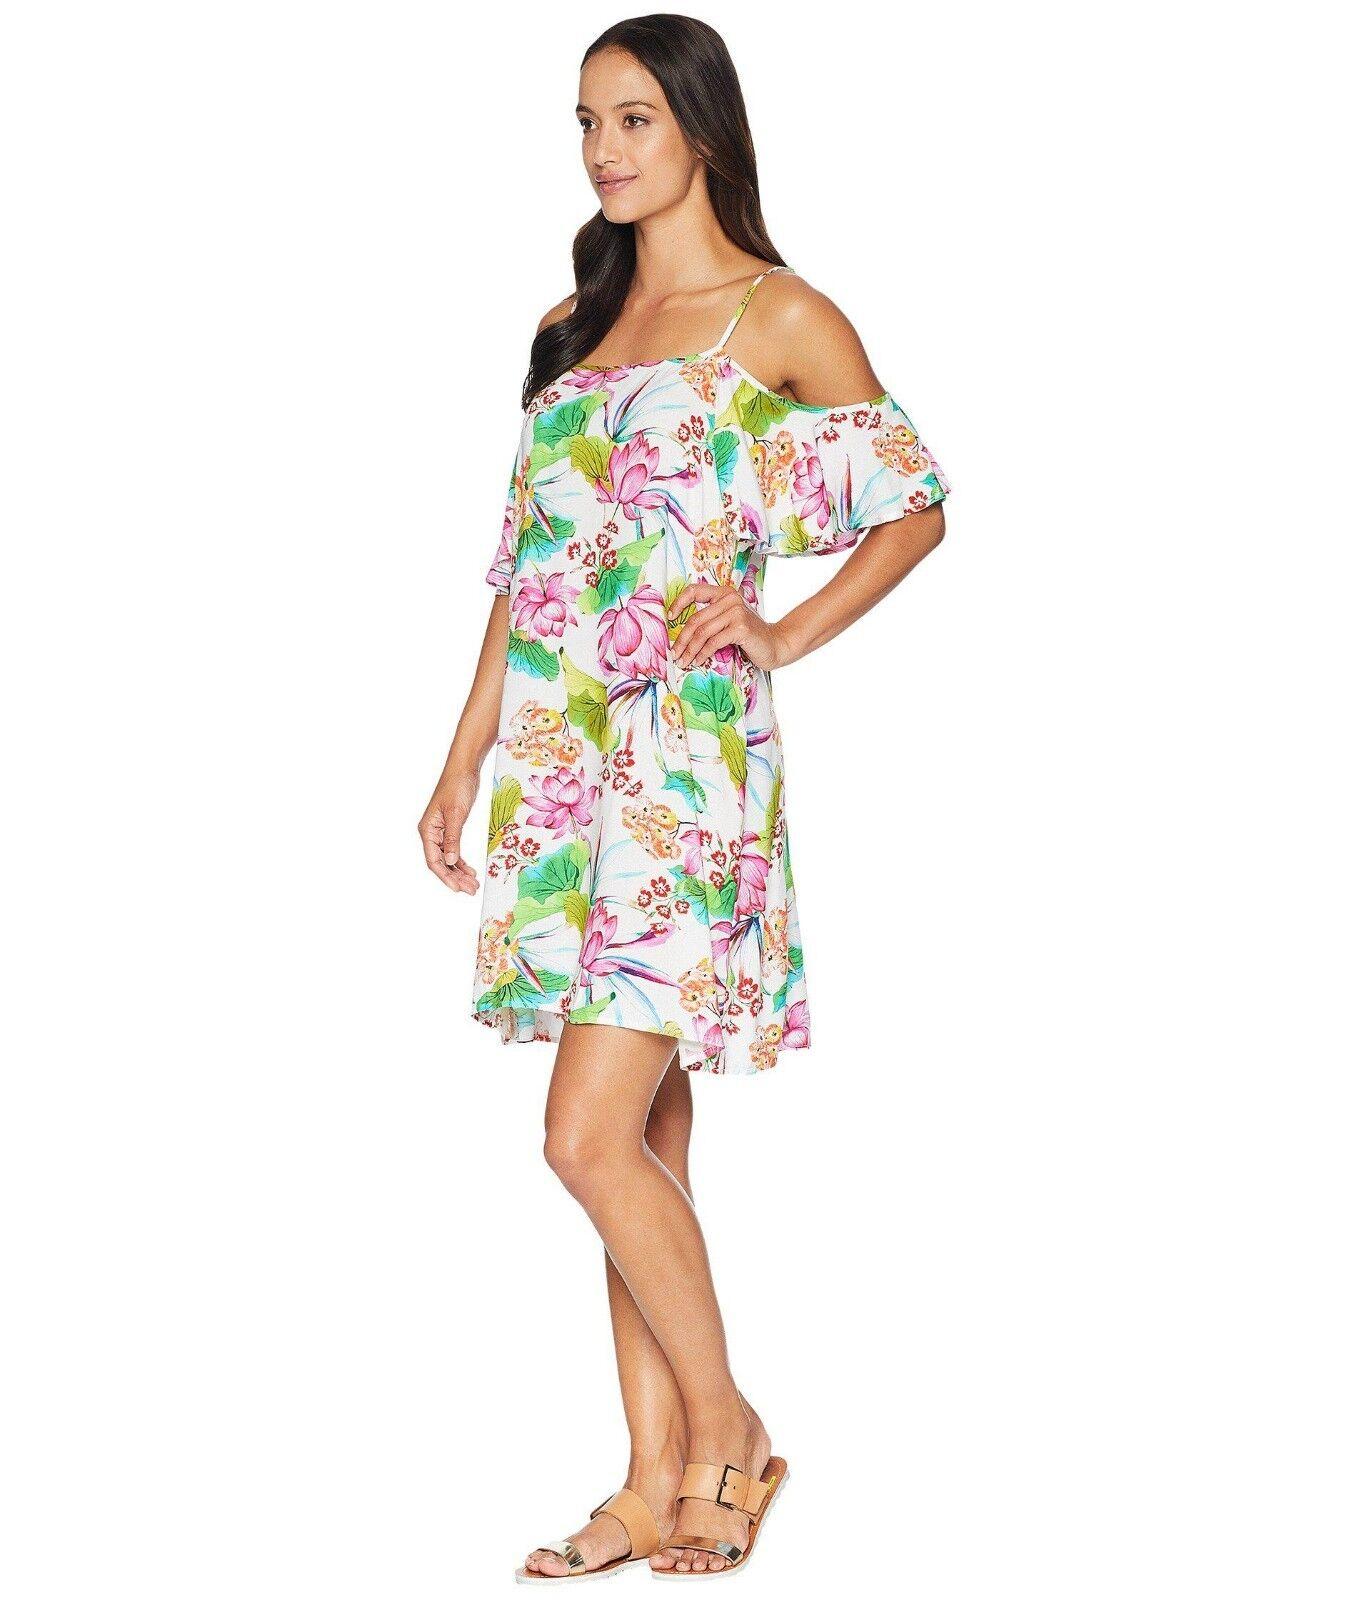 NEW La whitea Bora Bora Cold Shoulder Flutter Sleeve Dress  Cover up  Size S